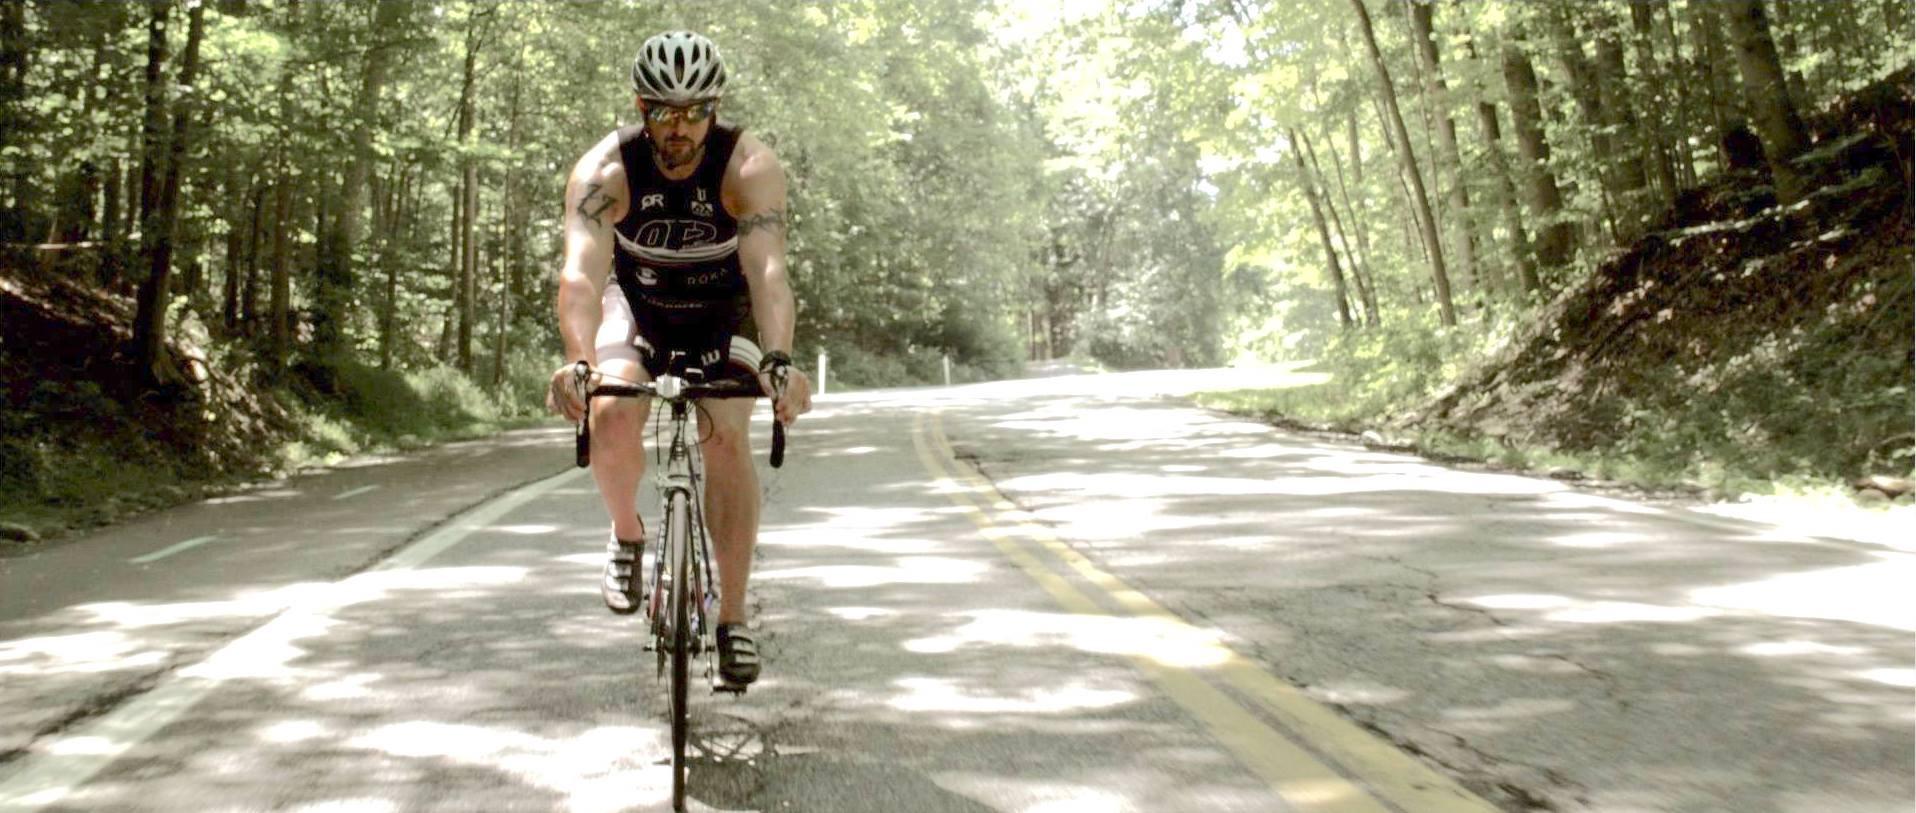 Shawn bike ride